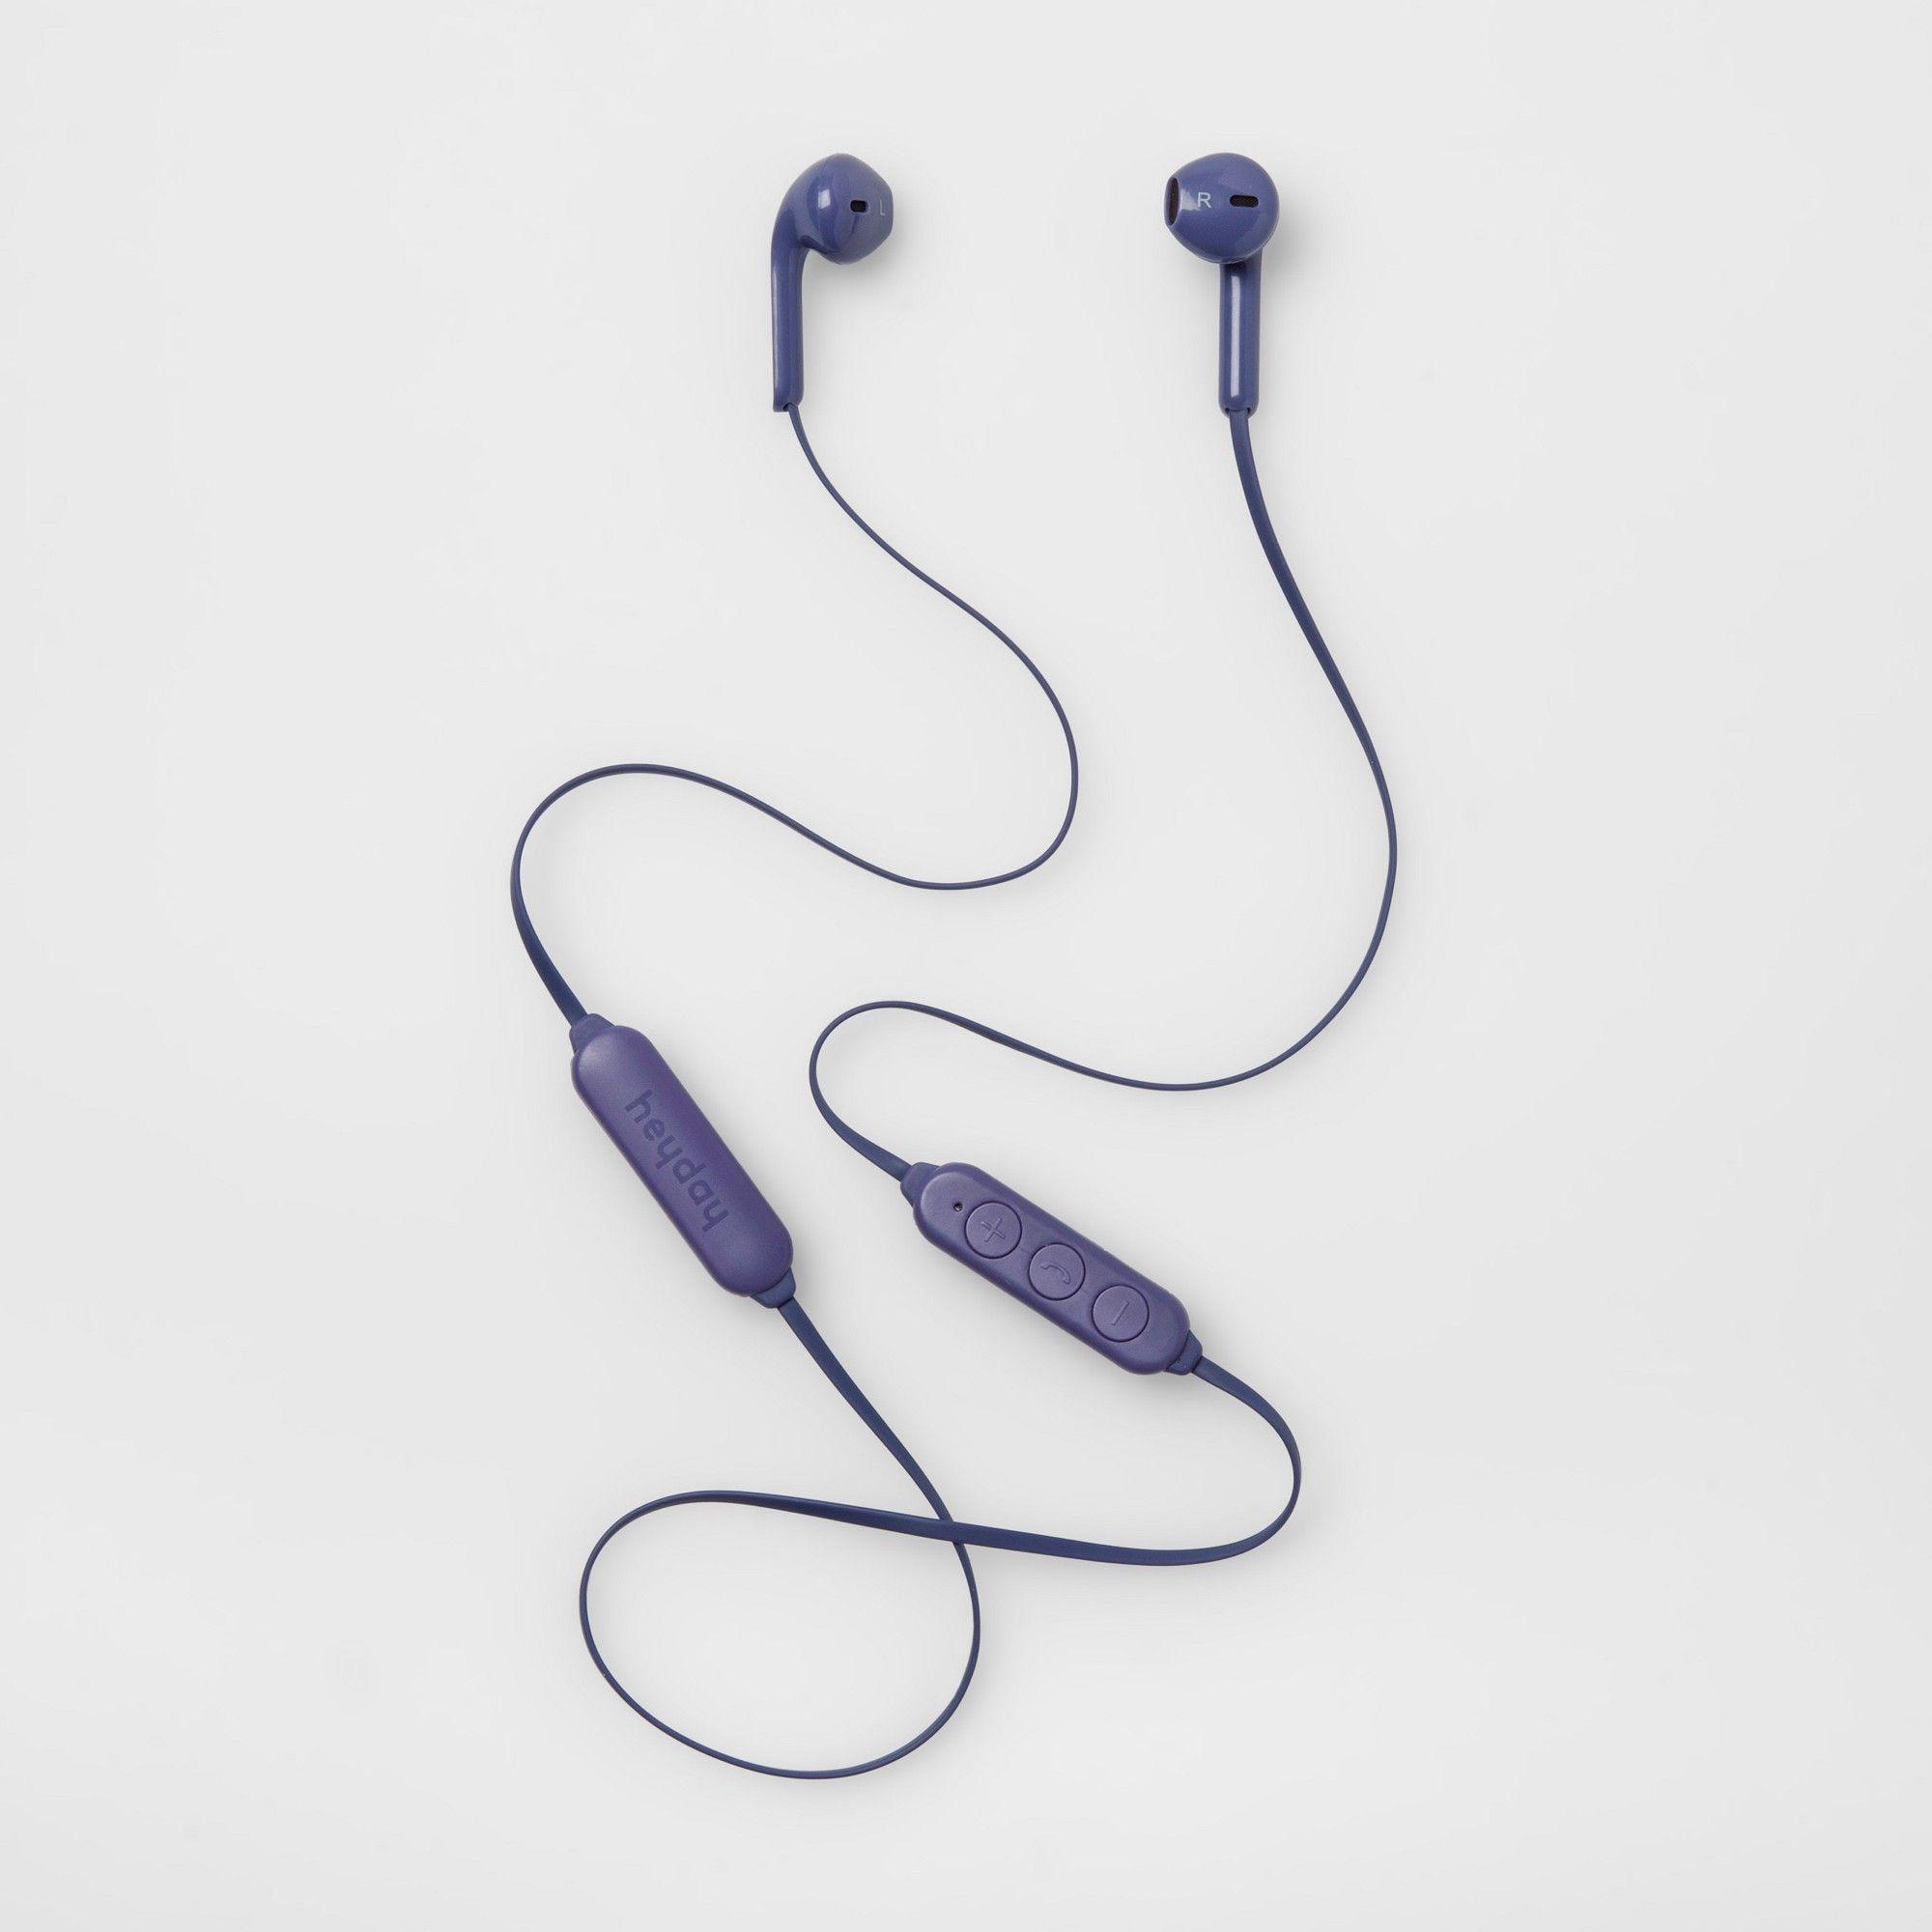 heyday Wireless Bluetooth Earbuds - Purple | Stuff to buy